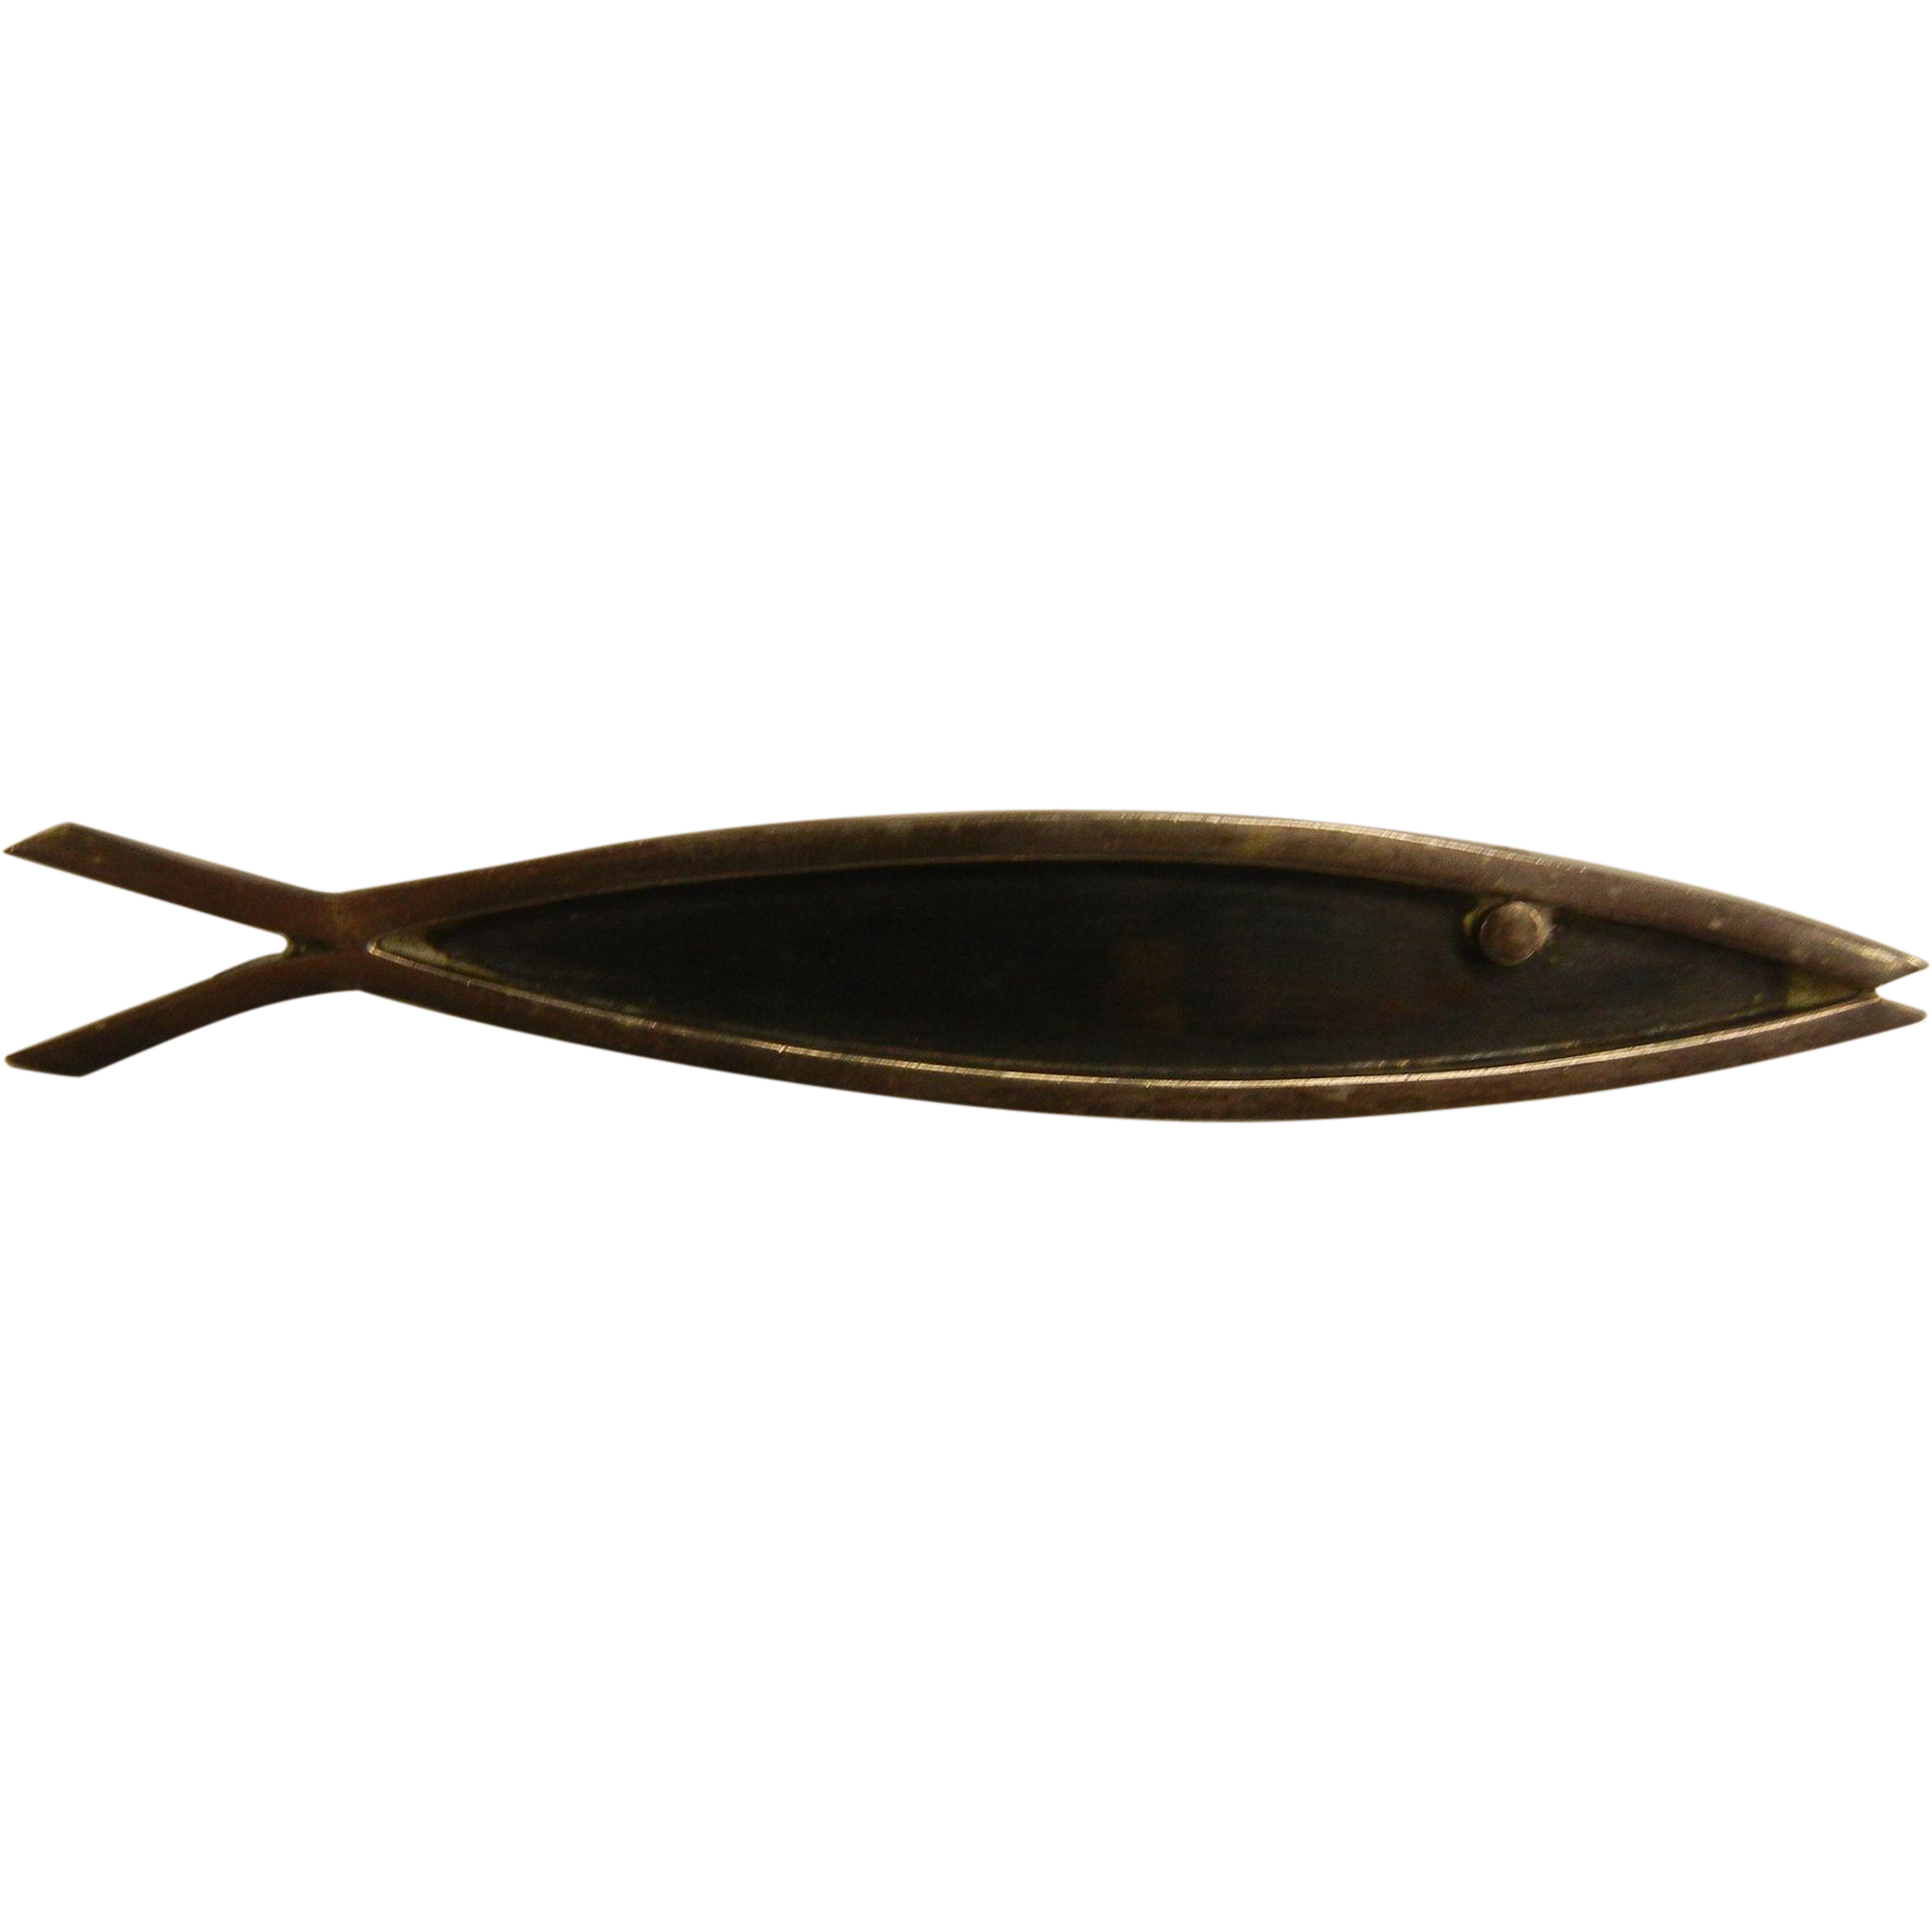 Vintage Mexican Hallmarked Sterling Silver Fish Brooch Del Fino